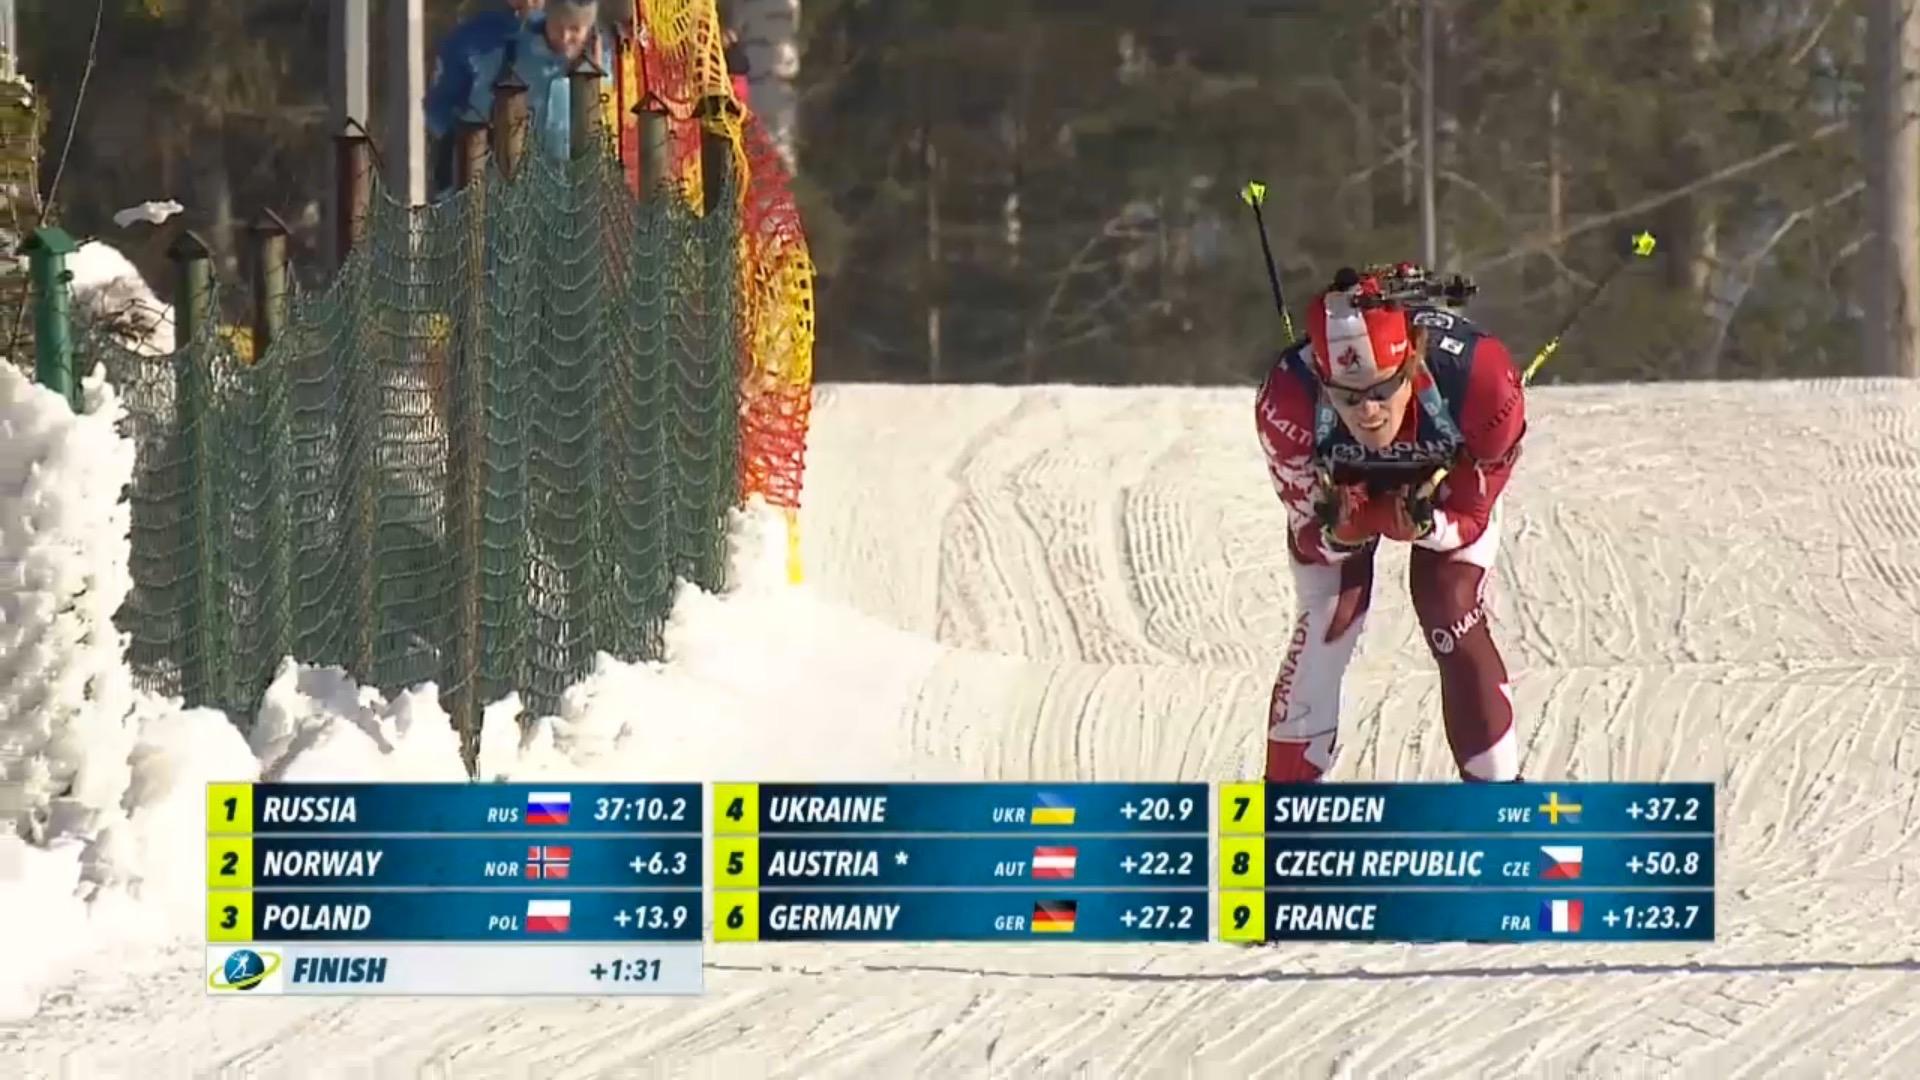 Biathlon Canada's Aidan Millar skiing the final loop of the single mixed relay at the 2017 IBU Open European Championships in Duszniki-Zdrój, Poland. With teammate Sarah Beaudry, Canada finished 13th (Photo: IBU/Eurovisionsports.tv screenshot)